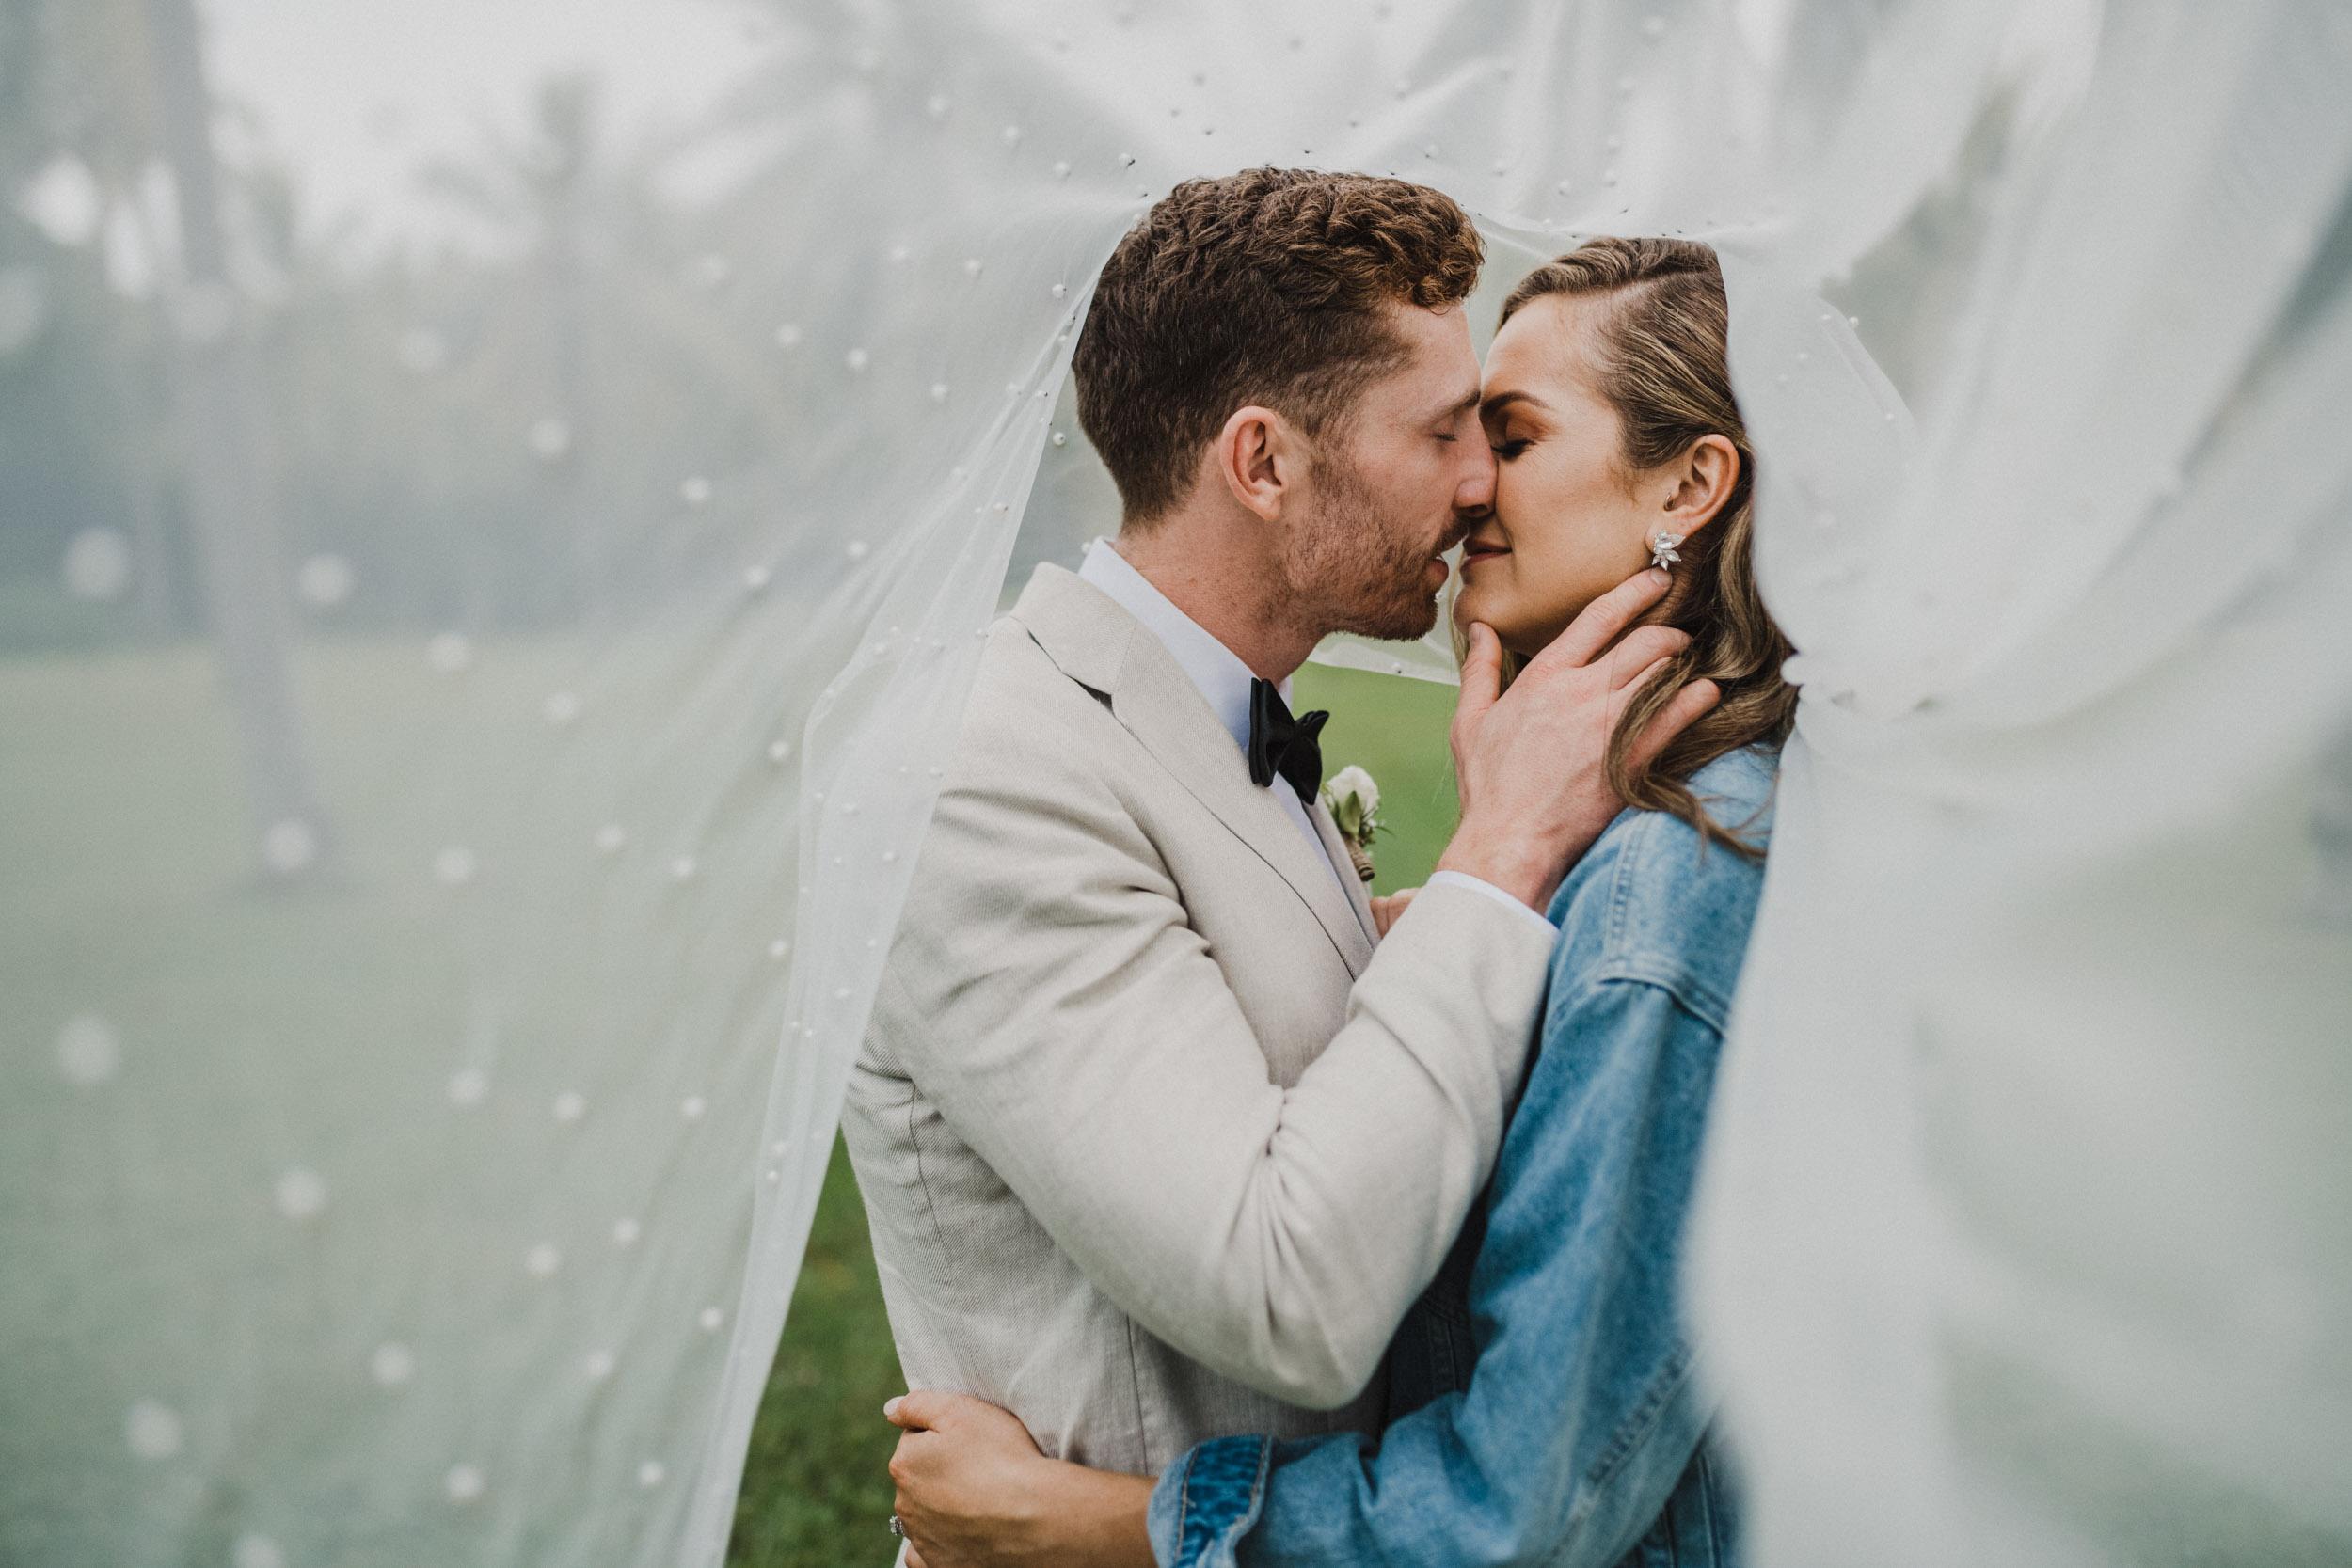 The Raw Photographer - Cairns Wedding Photographer - Port Douglas - Sugar Wharf - Vasaliki Couture Dress - Destination Venue-65.jpg